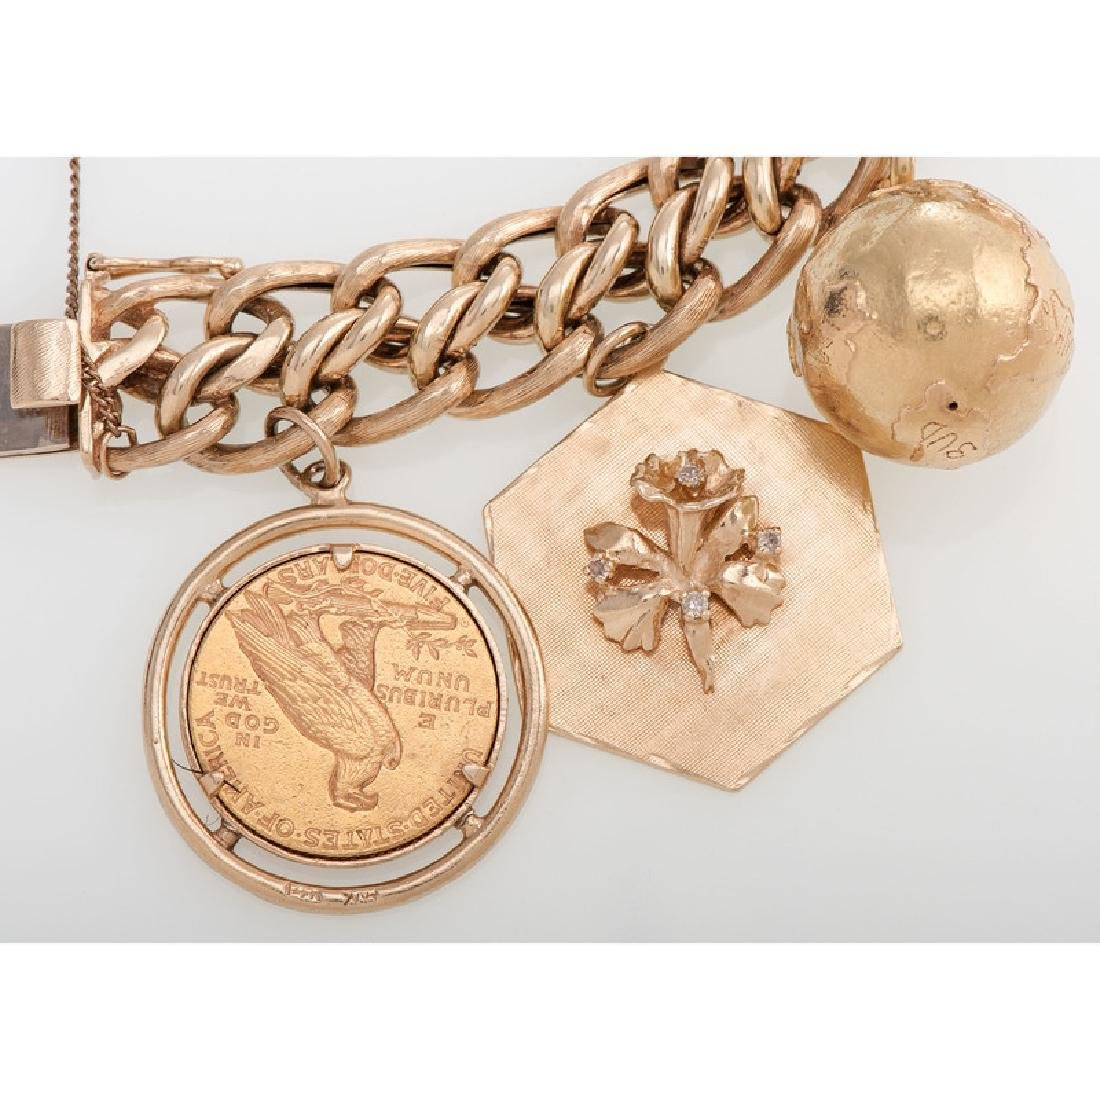 14 Karat Yellow Gold Charm Bracelet - 3